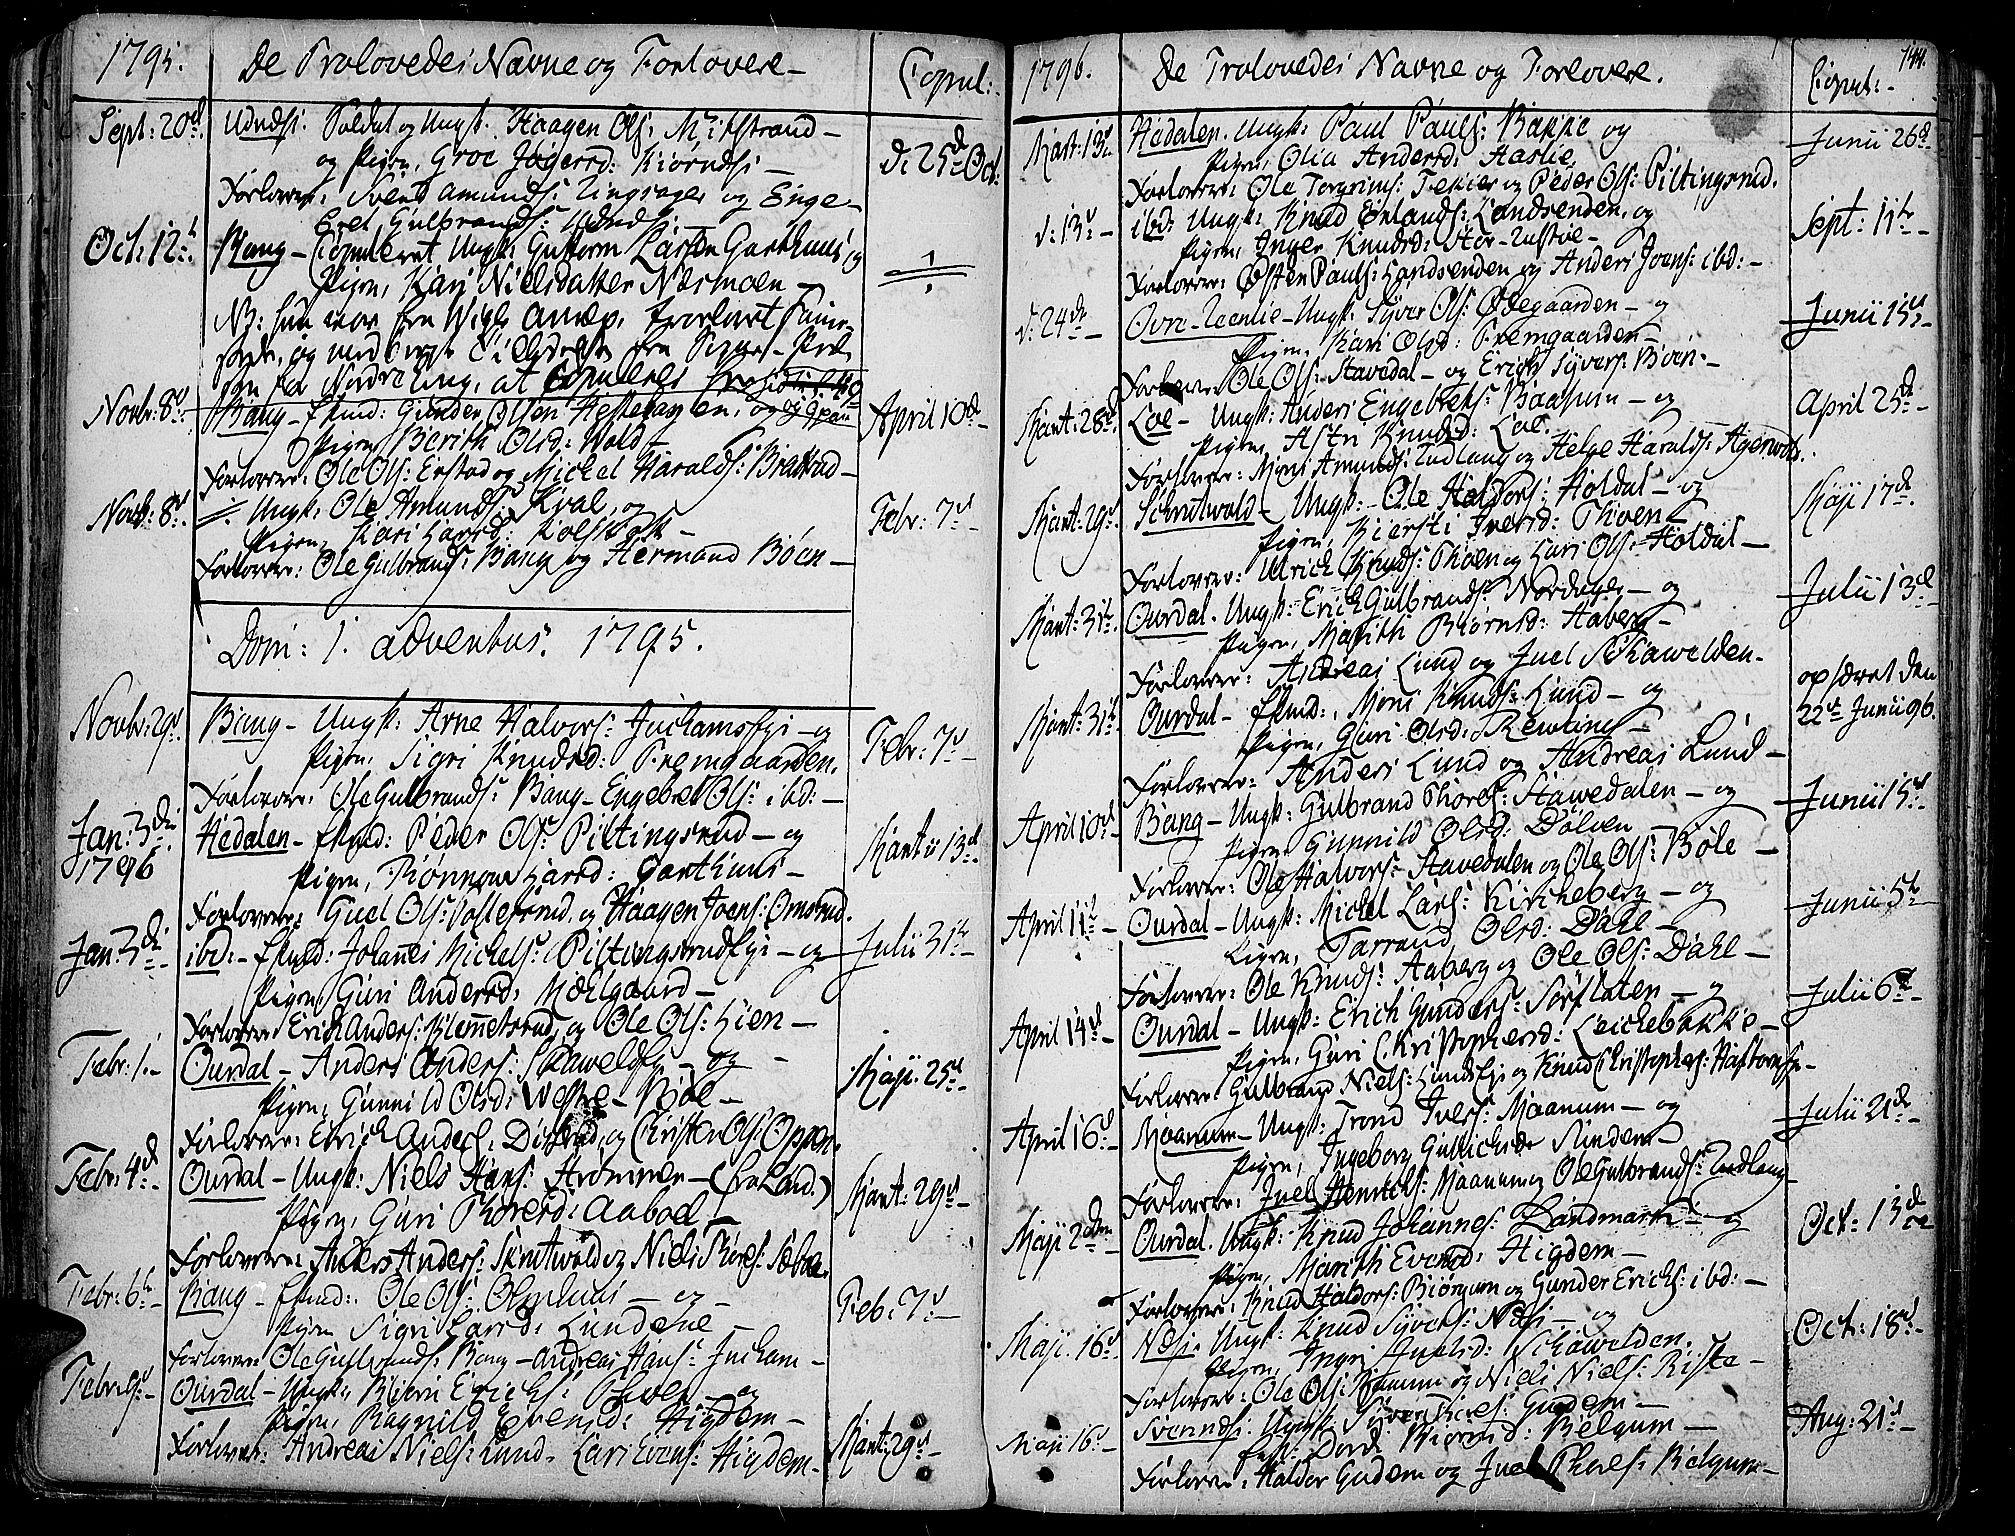 SAH, Aurdal prestekontor, Ministerialbok nr. 6, 1781-1804, s. 144